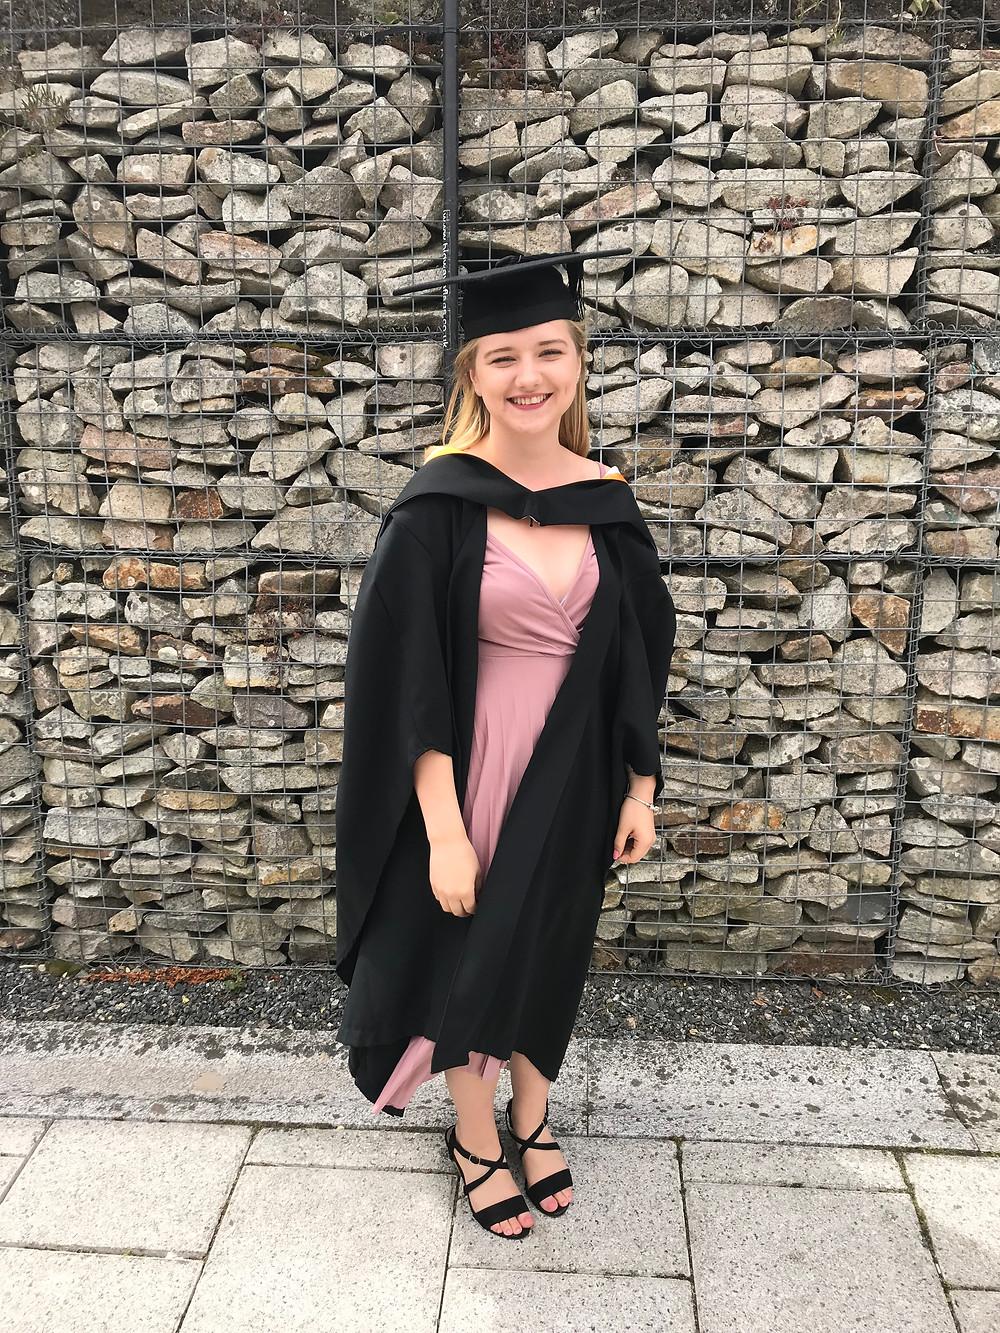 Graduating from Falmouth University